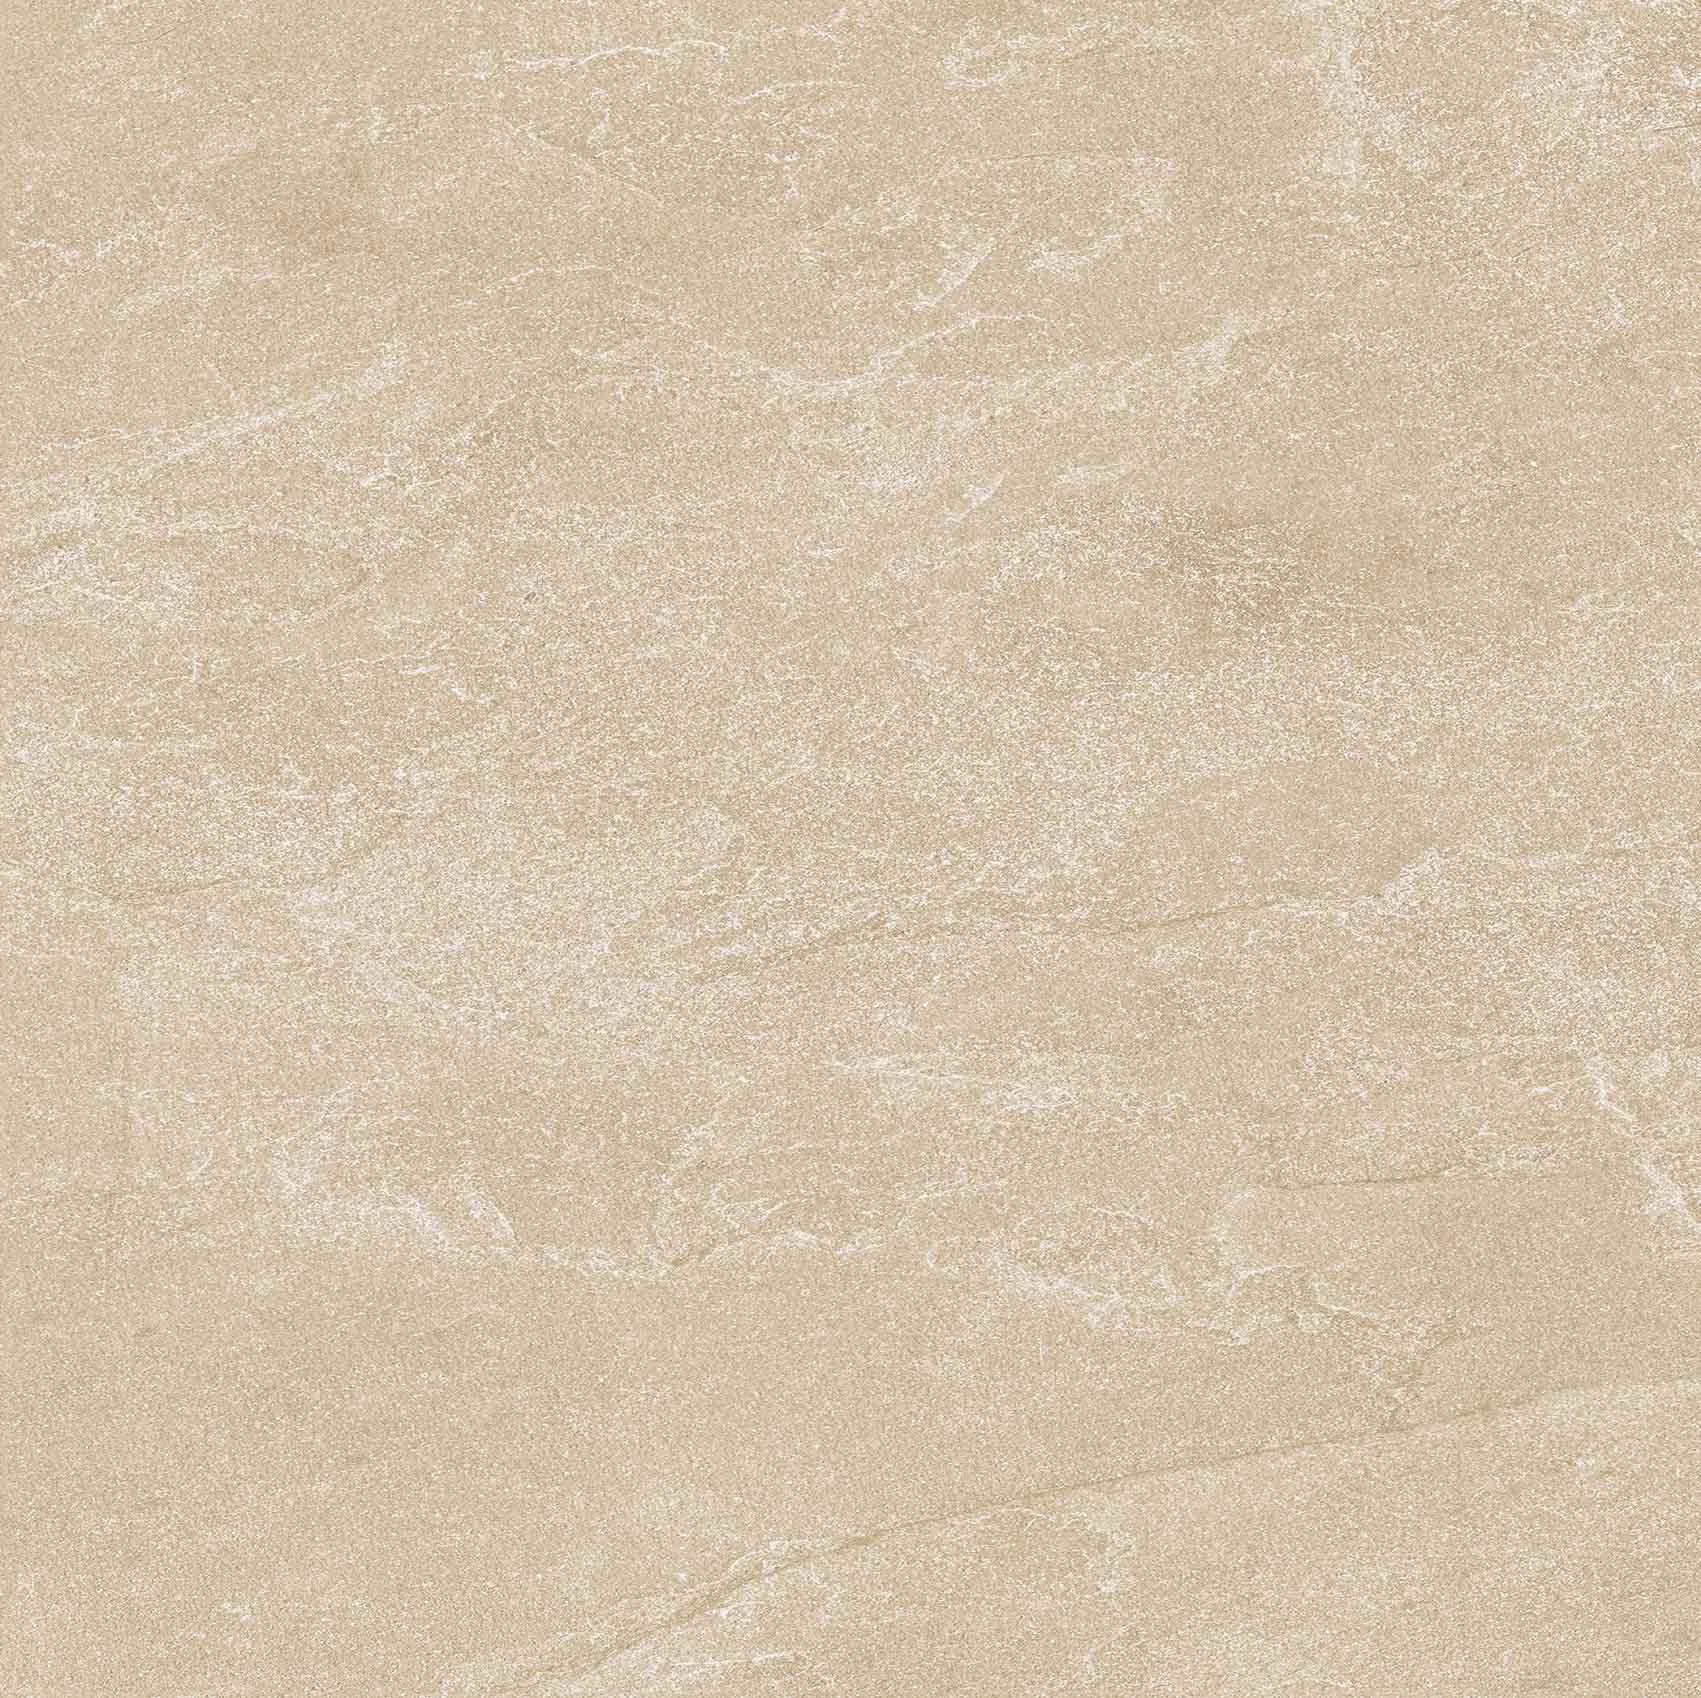 Natural Stone Cream Bush-hammered 20mm 60 x 60